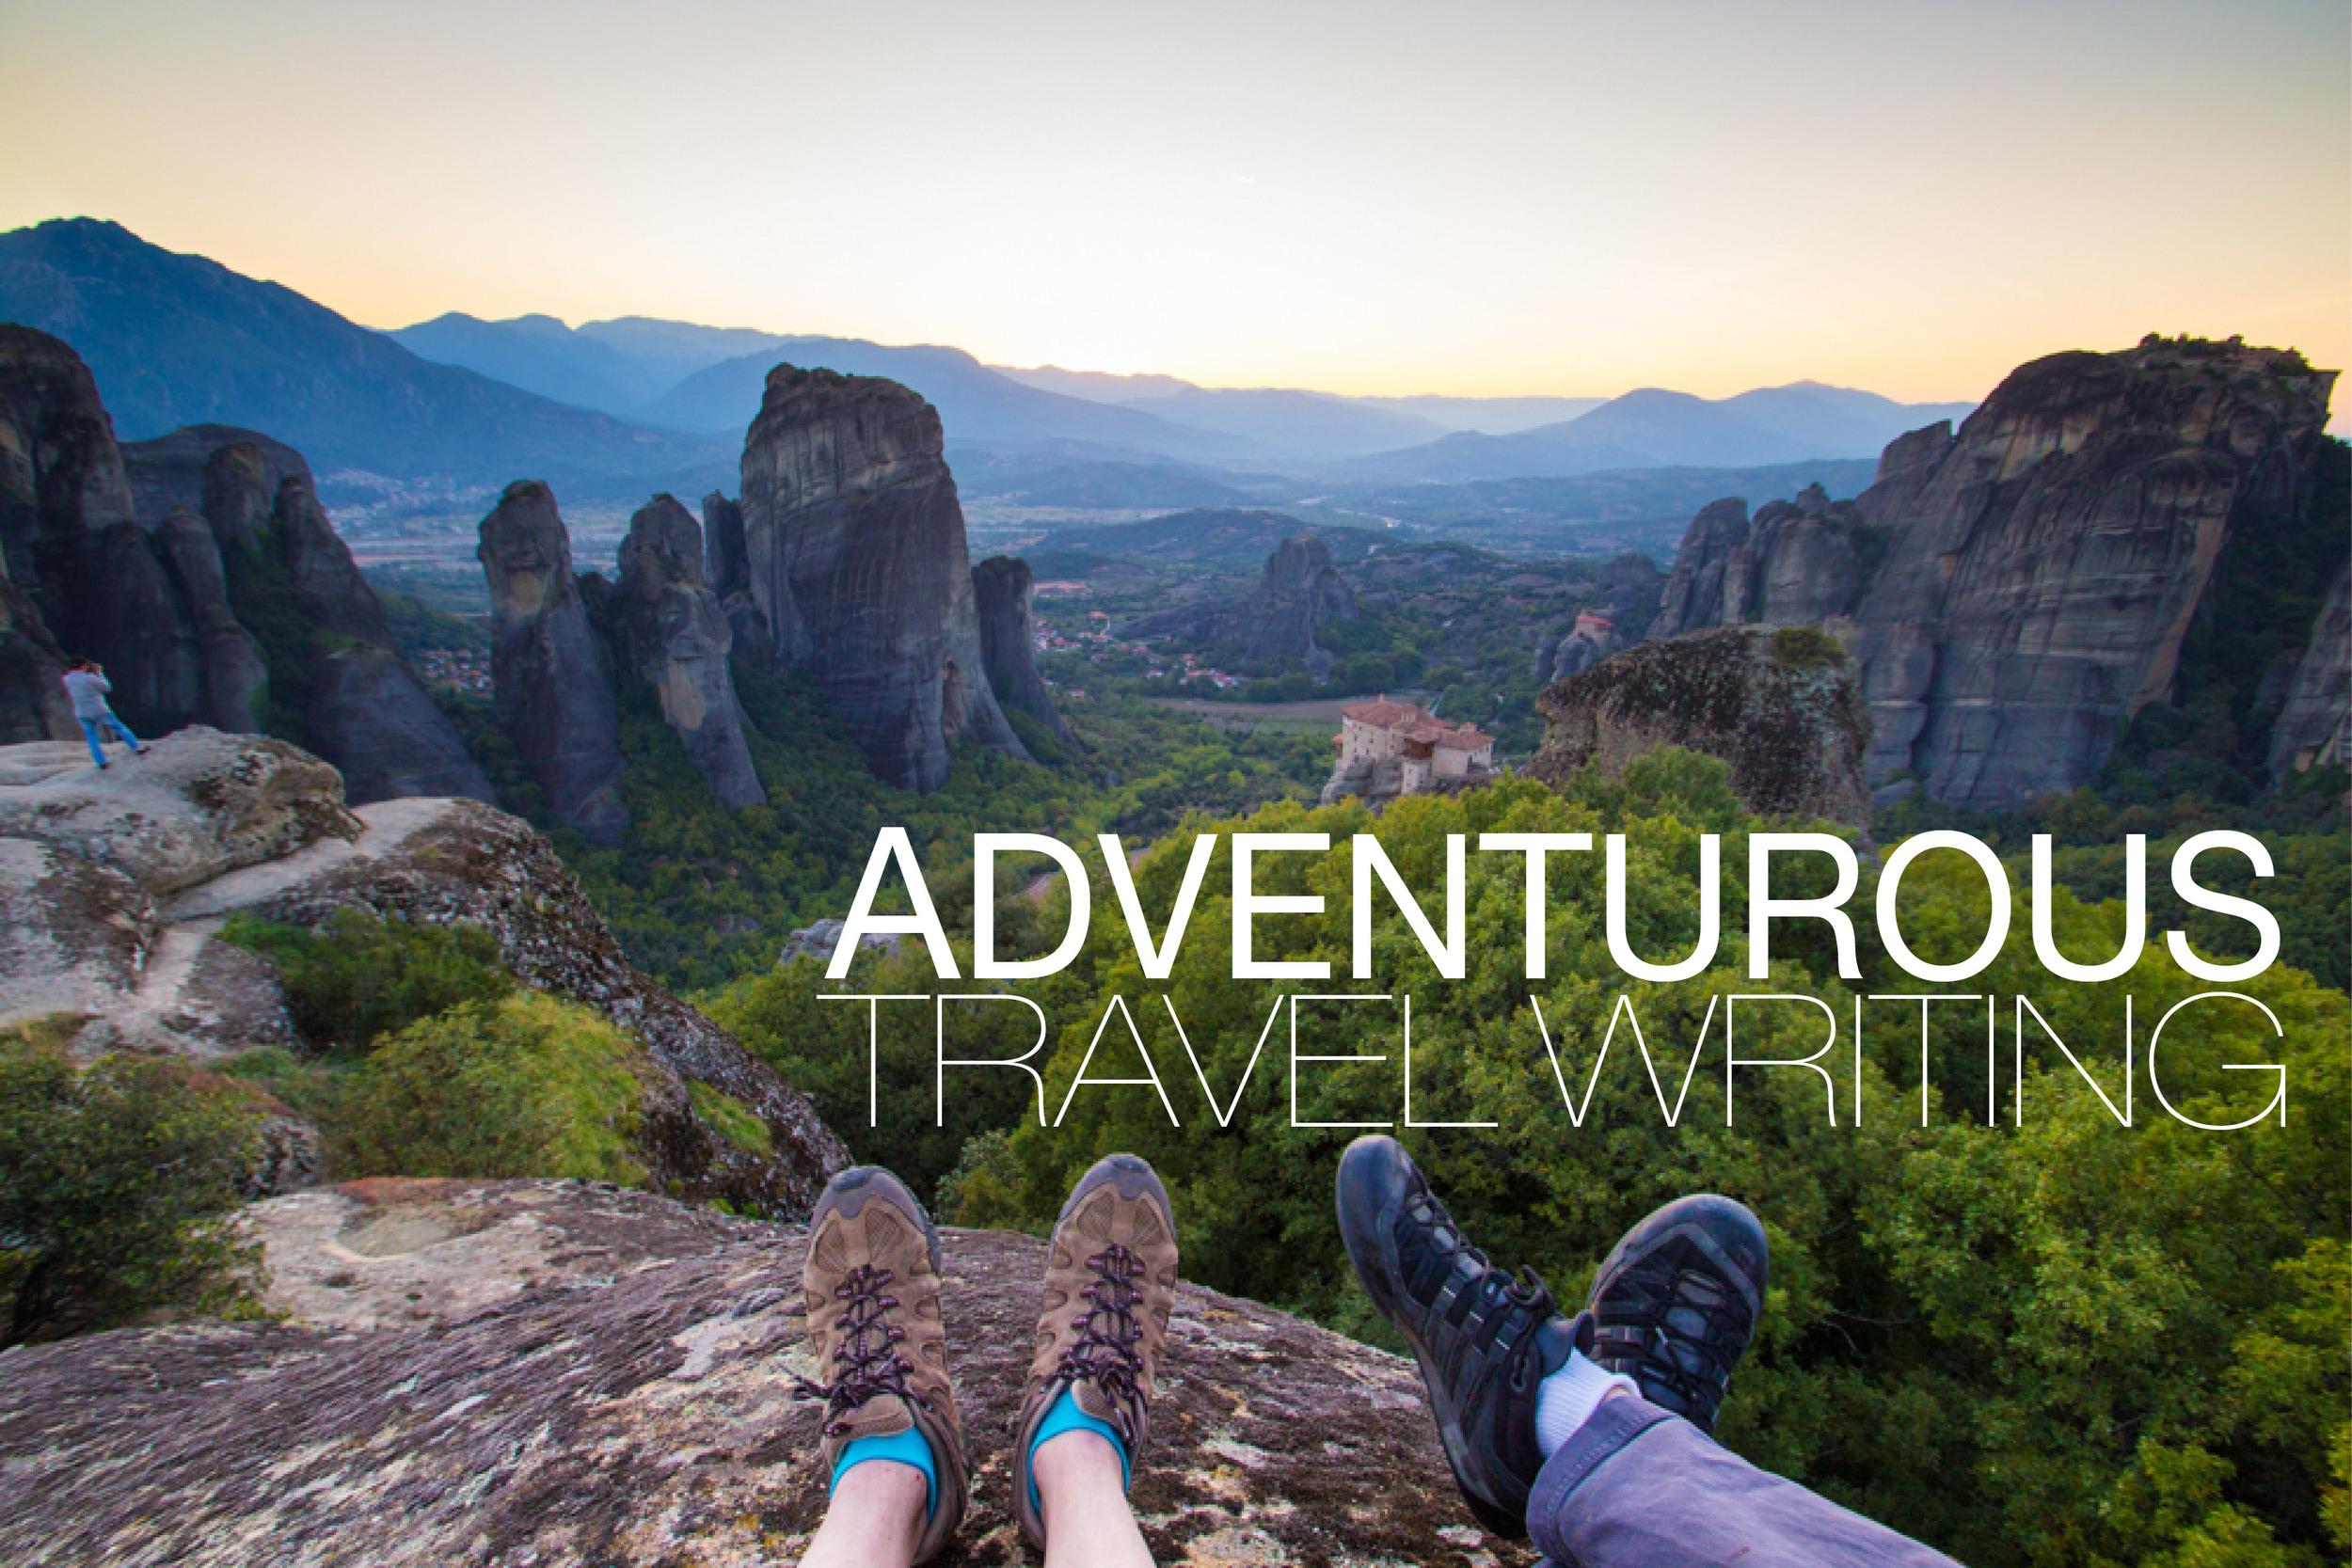 adventurous writing & Travel -01.jpg